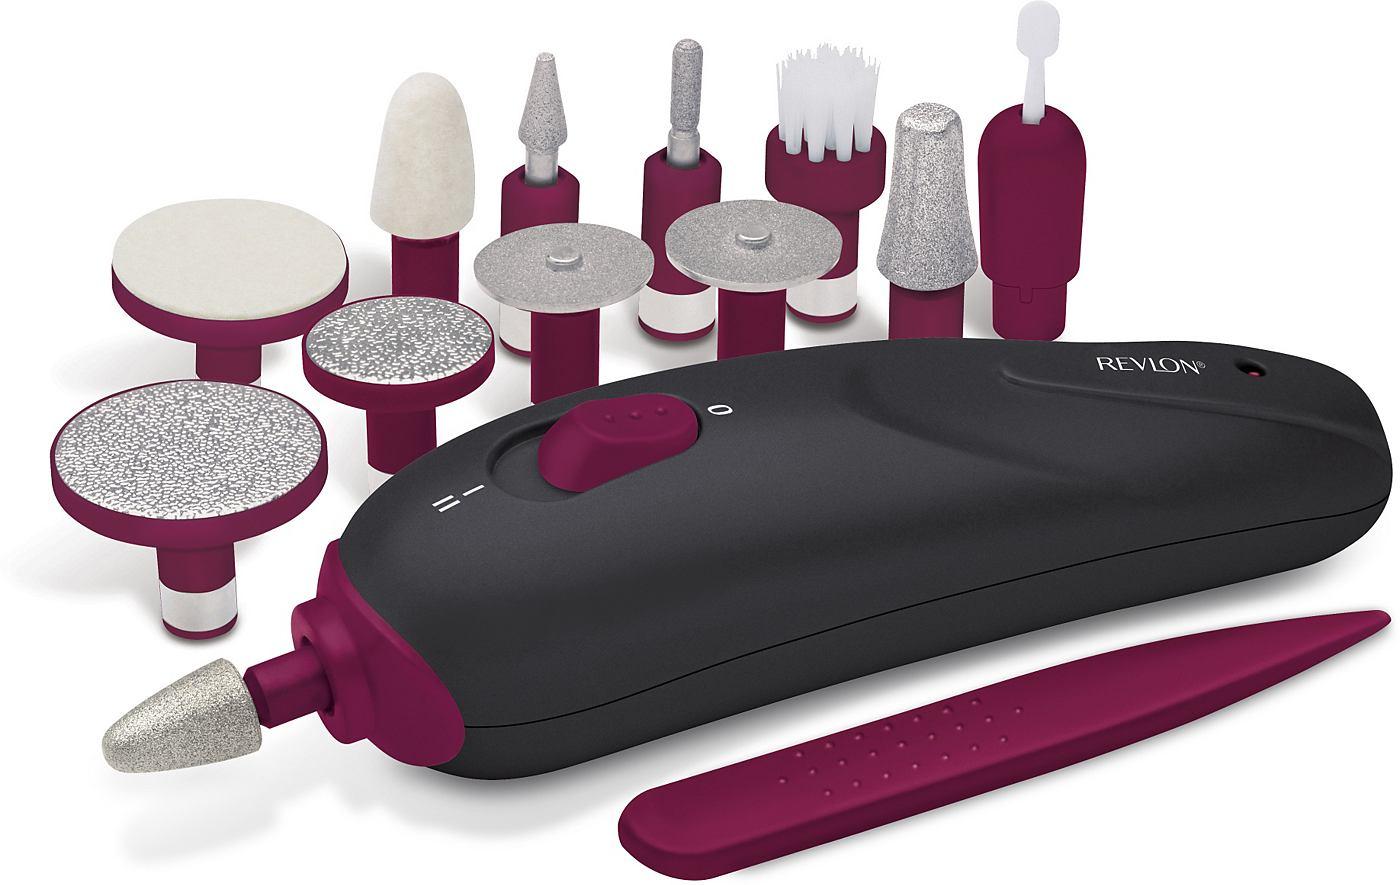 REVLON Pedicure/manicure STYLE & DRY RVSP3529PKE